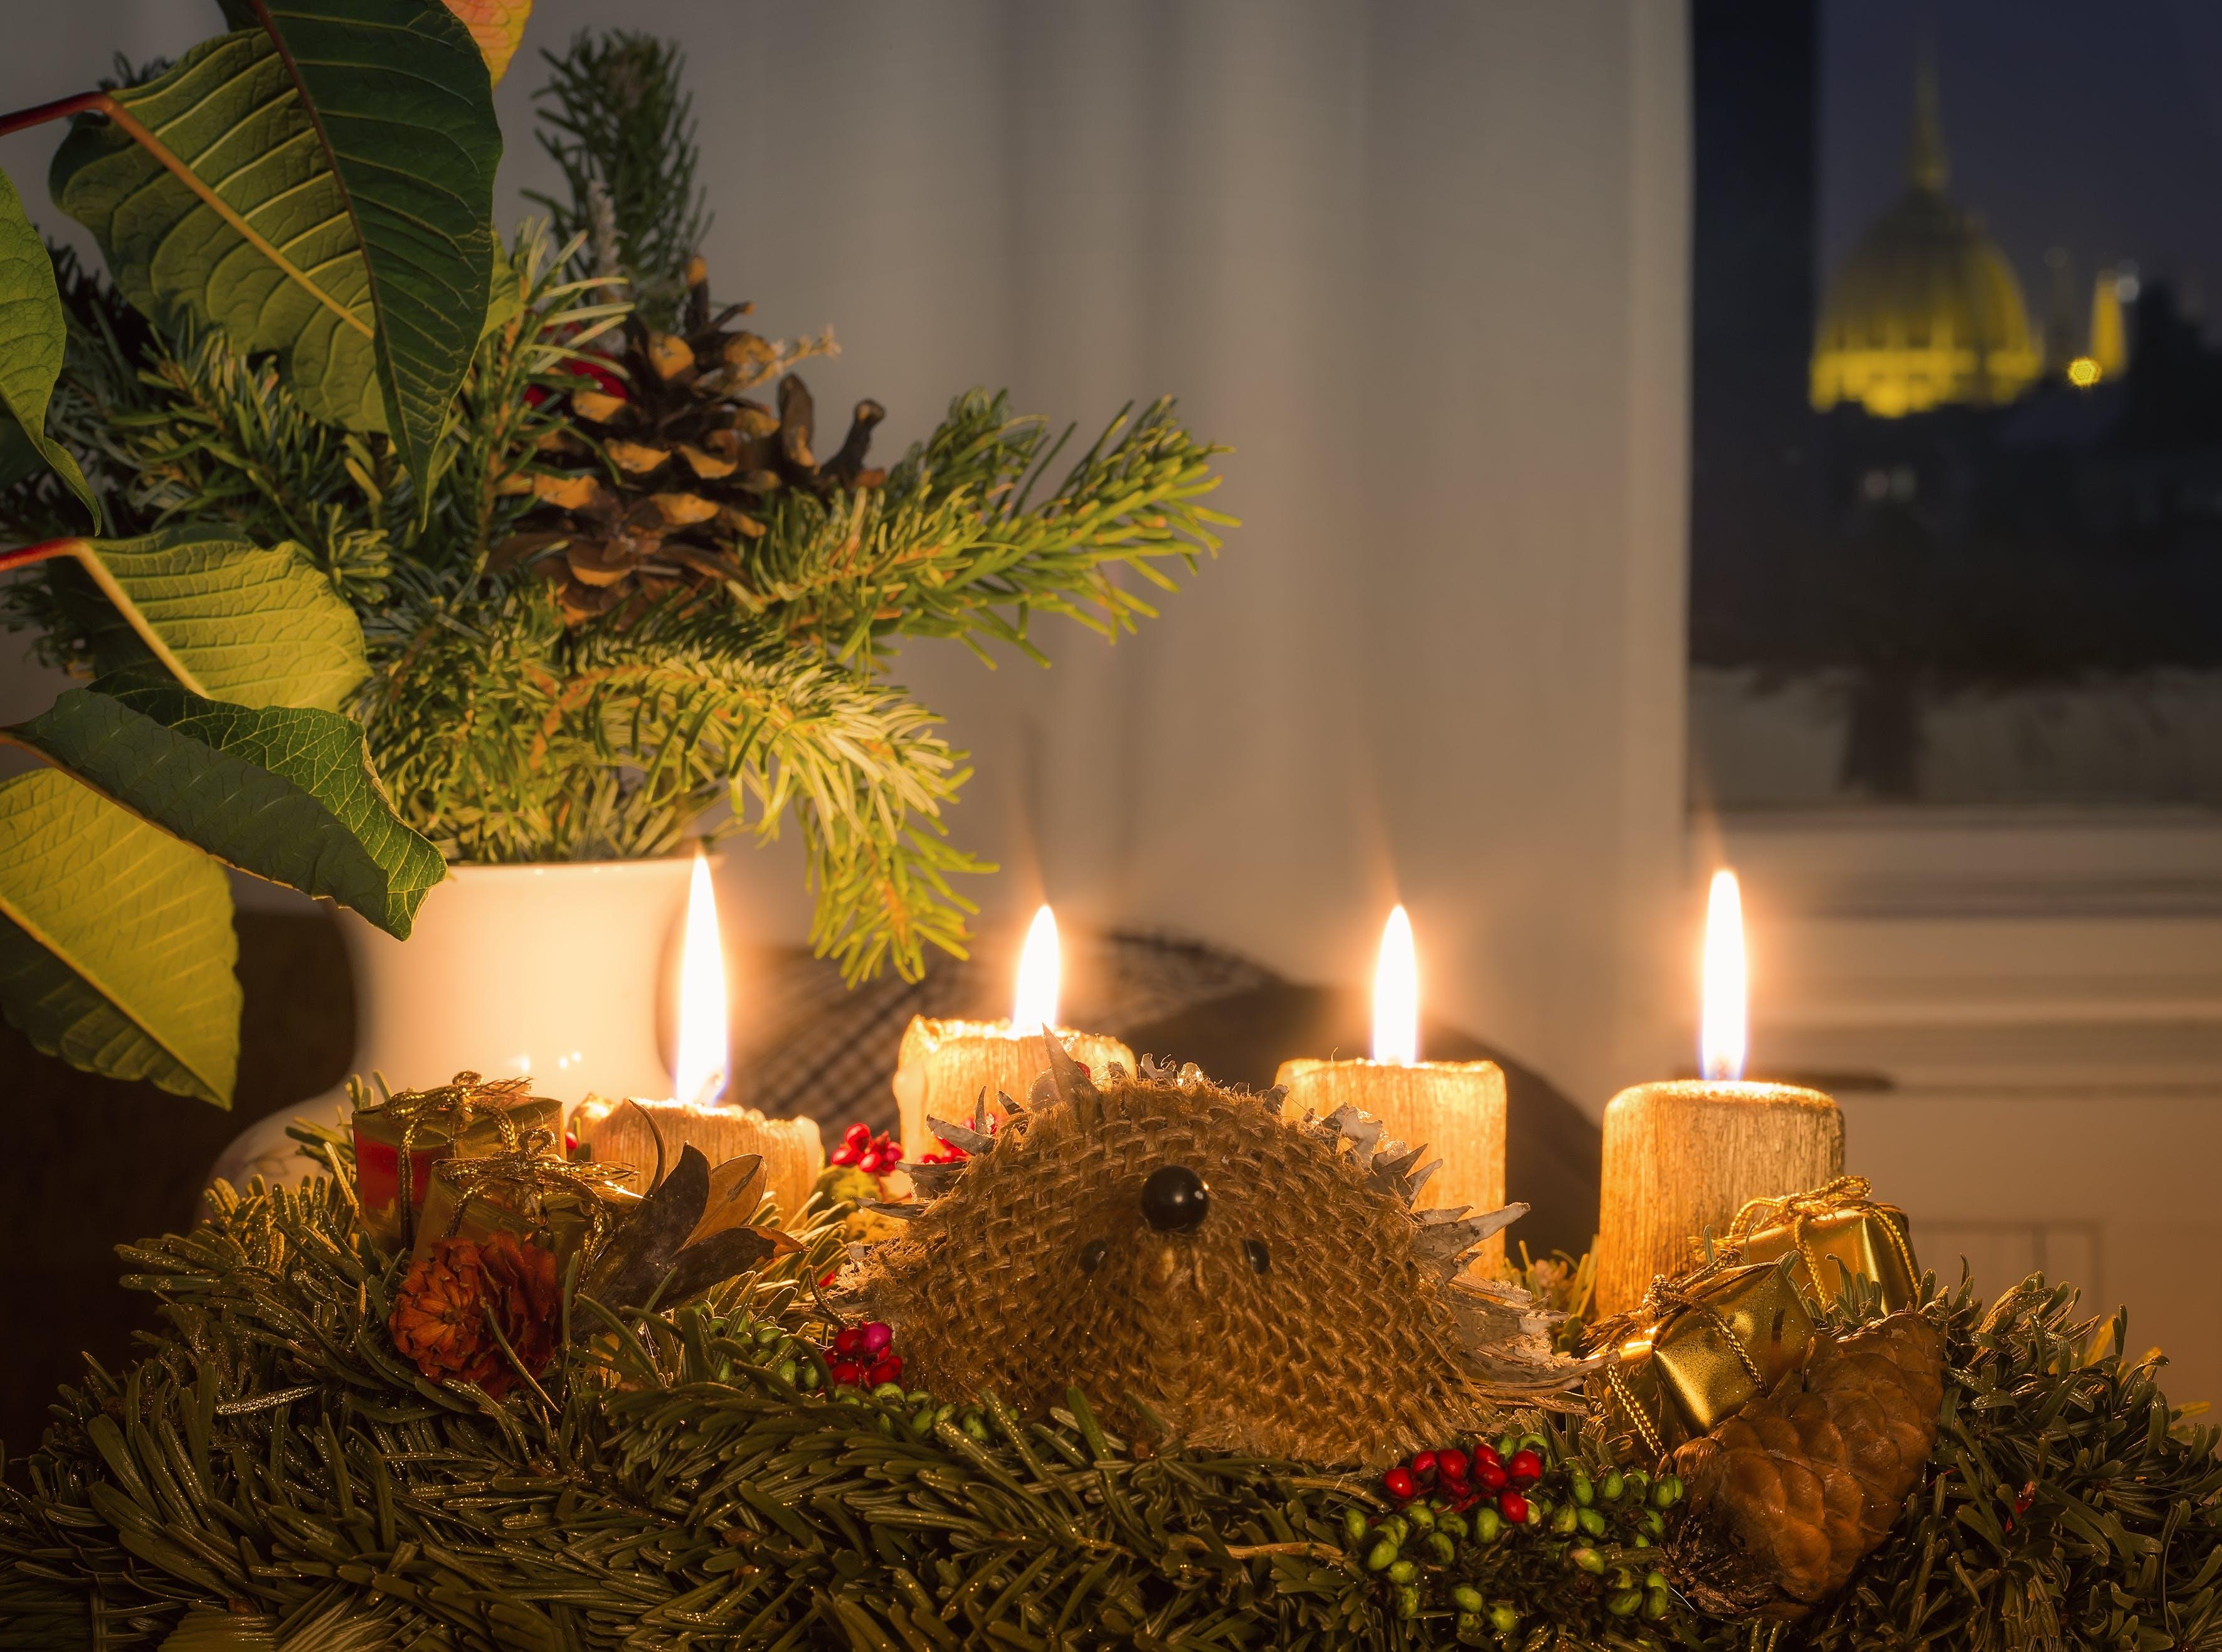 Free stock photo of Adobe Photoshop, advent, Budapest, candle